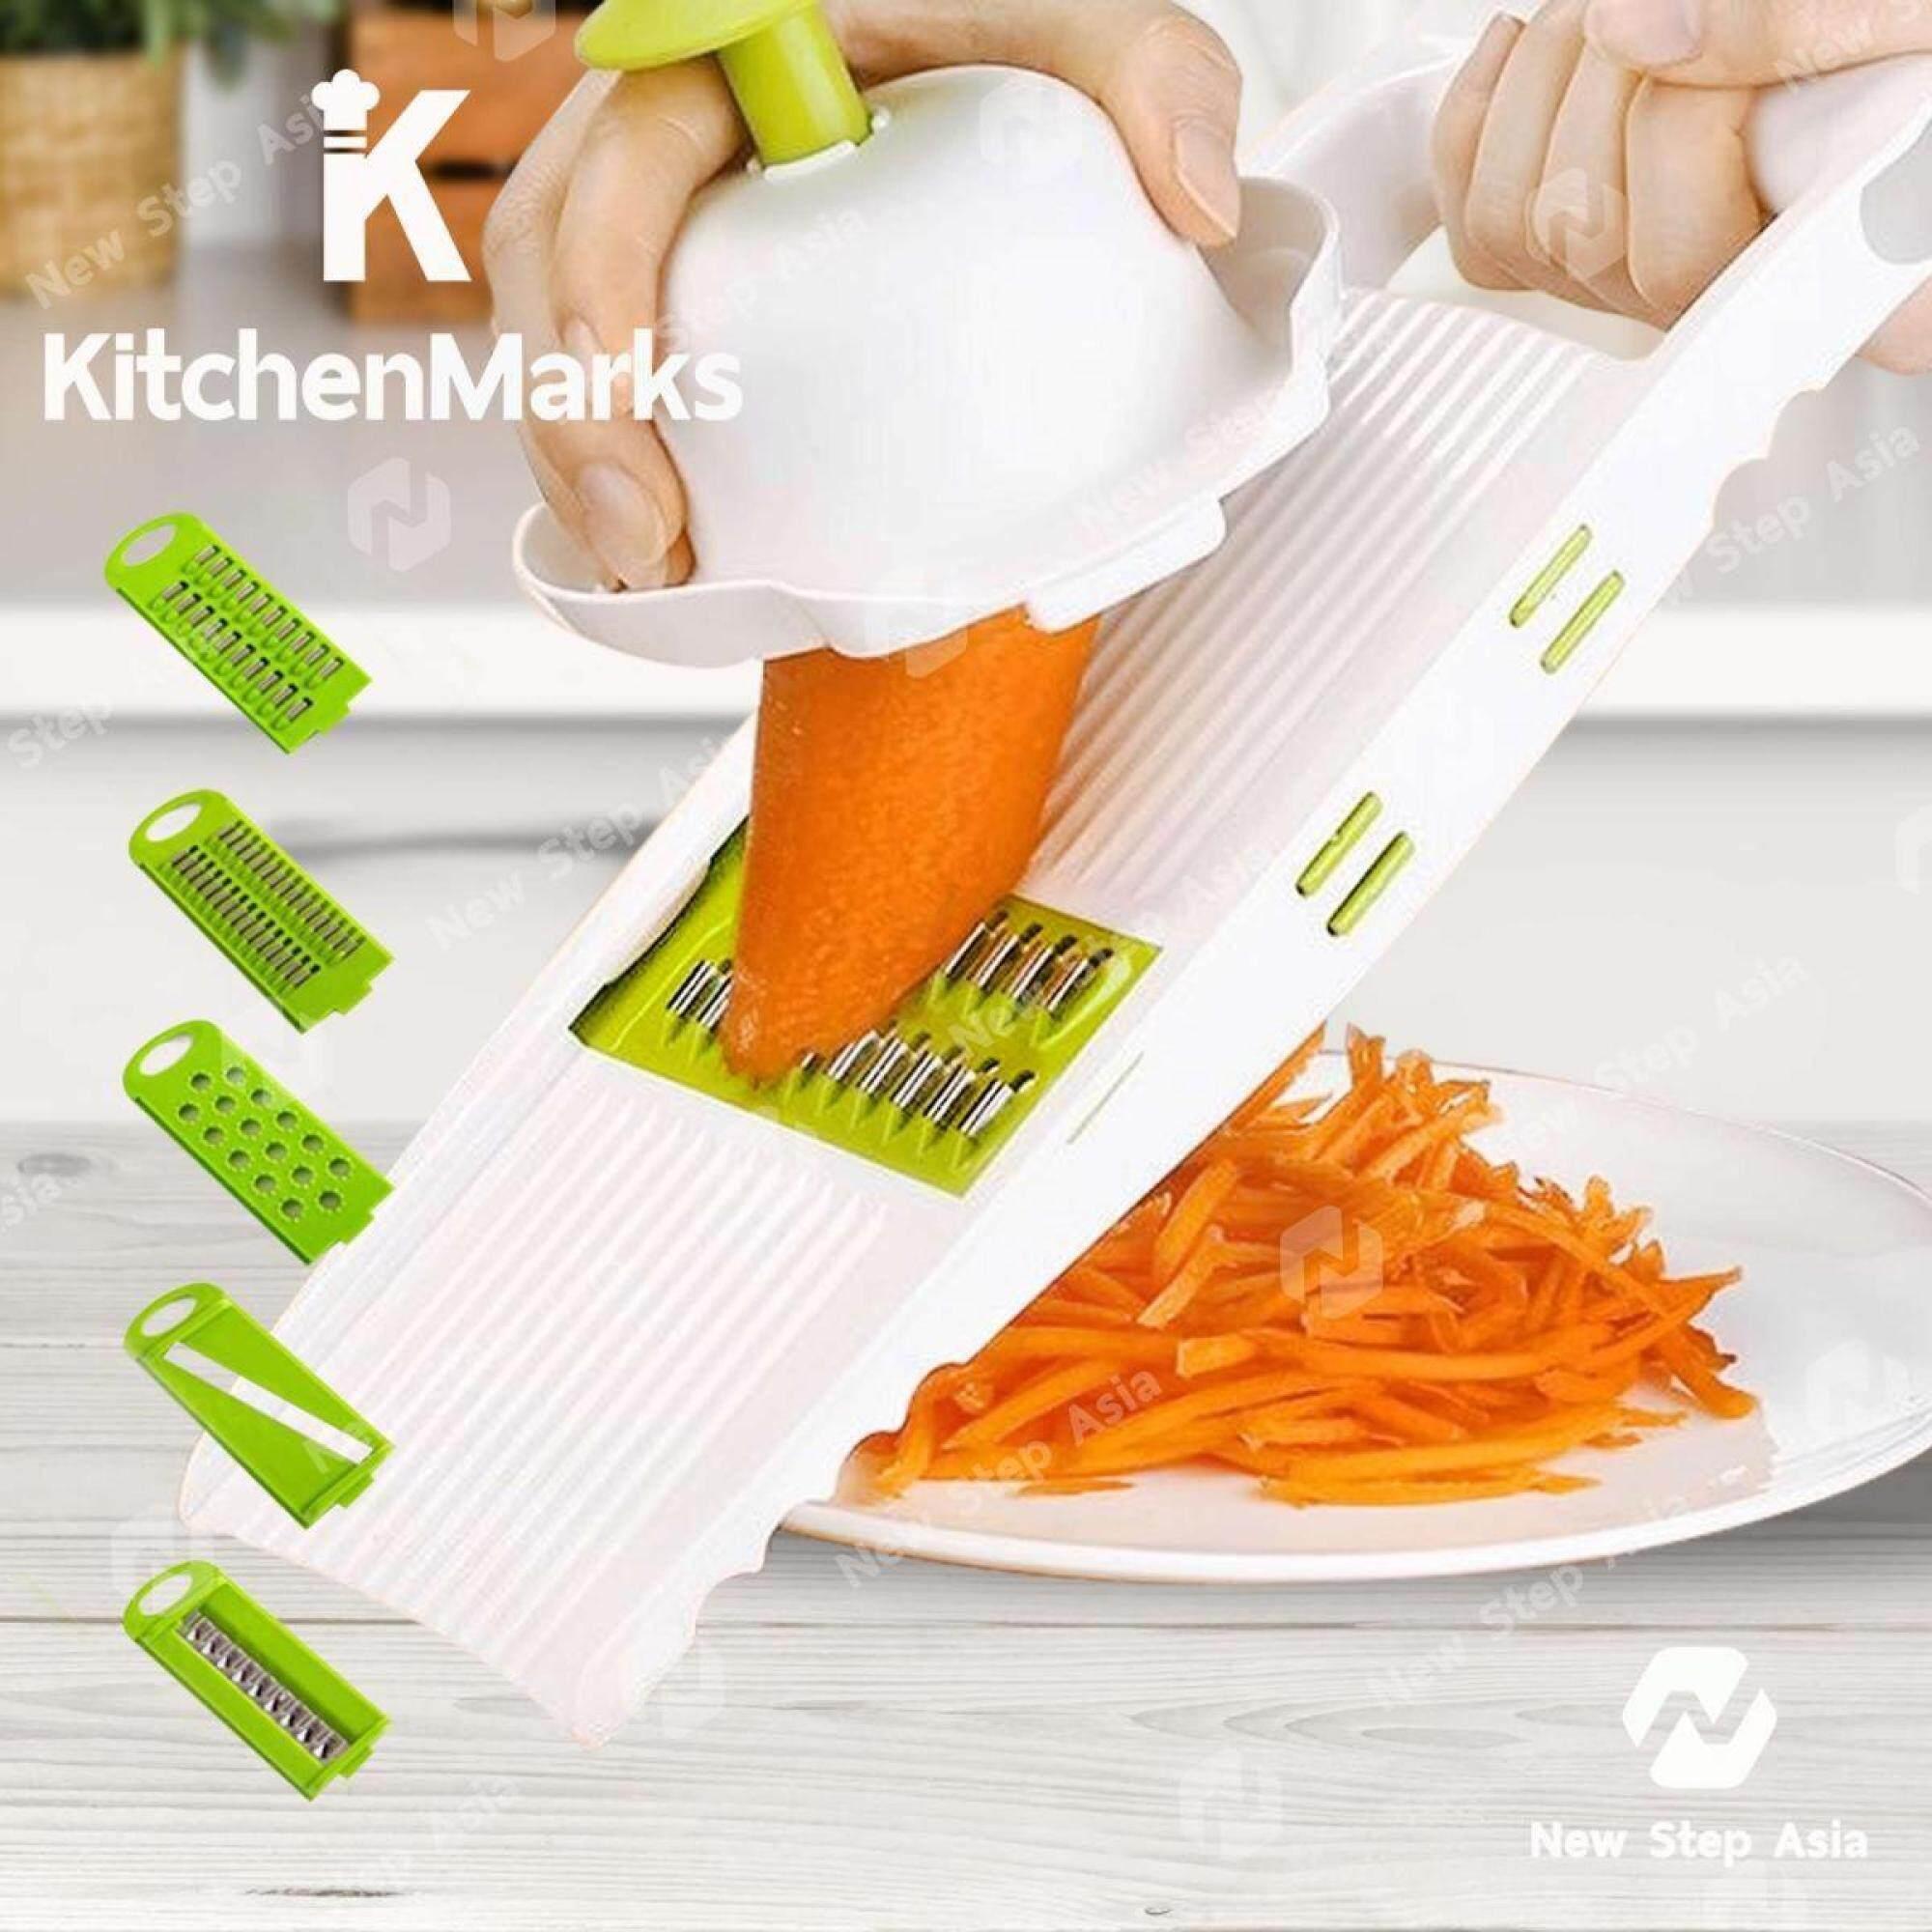 Kitchenmarks ชุดสไลด์ผักผลไม้ ใบมีดสแตนเลส 5 In 1 ด้ามจับพิเศษ ชุดมีดหั่นผักอเนกประสงค์ ชุดอุปกรณ์ปอกผักผลไม้ เครื่องหั่นผักผลไม้ที่หั่นผักผลไม้ ที่ขูดผักผลไม้ เครื่องหั่นผัก Multifunctional Fruit Vegetable Slice Nicer Dicer Slicers New Step Asia By Homehuk - New Step Asia.